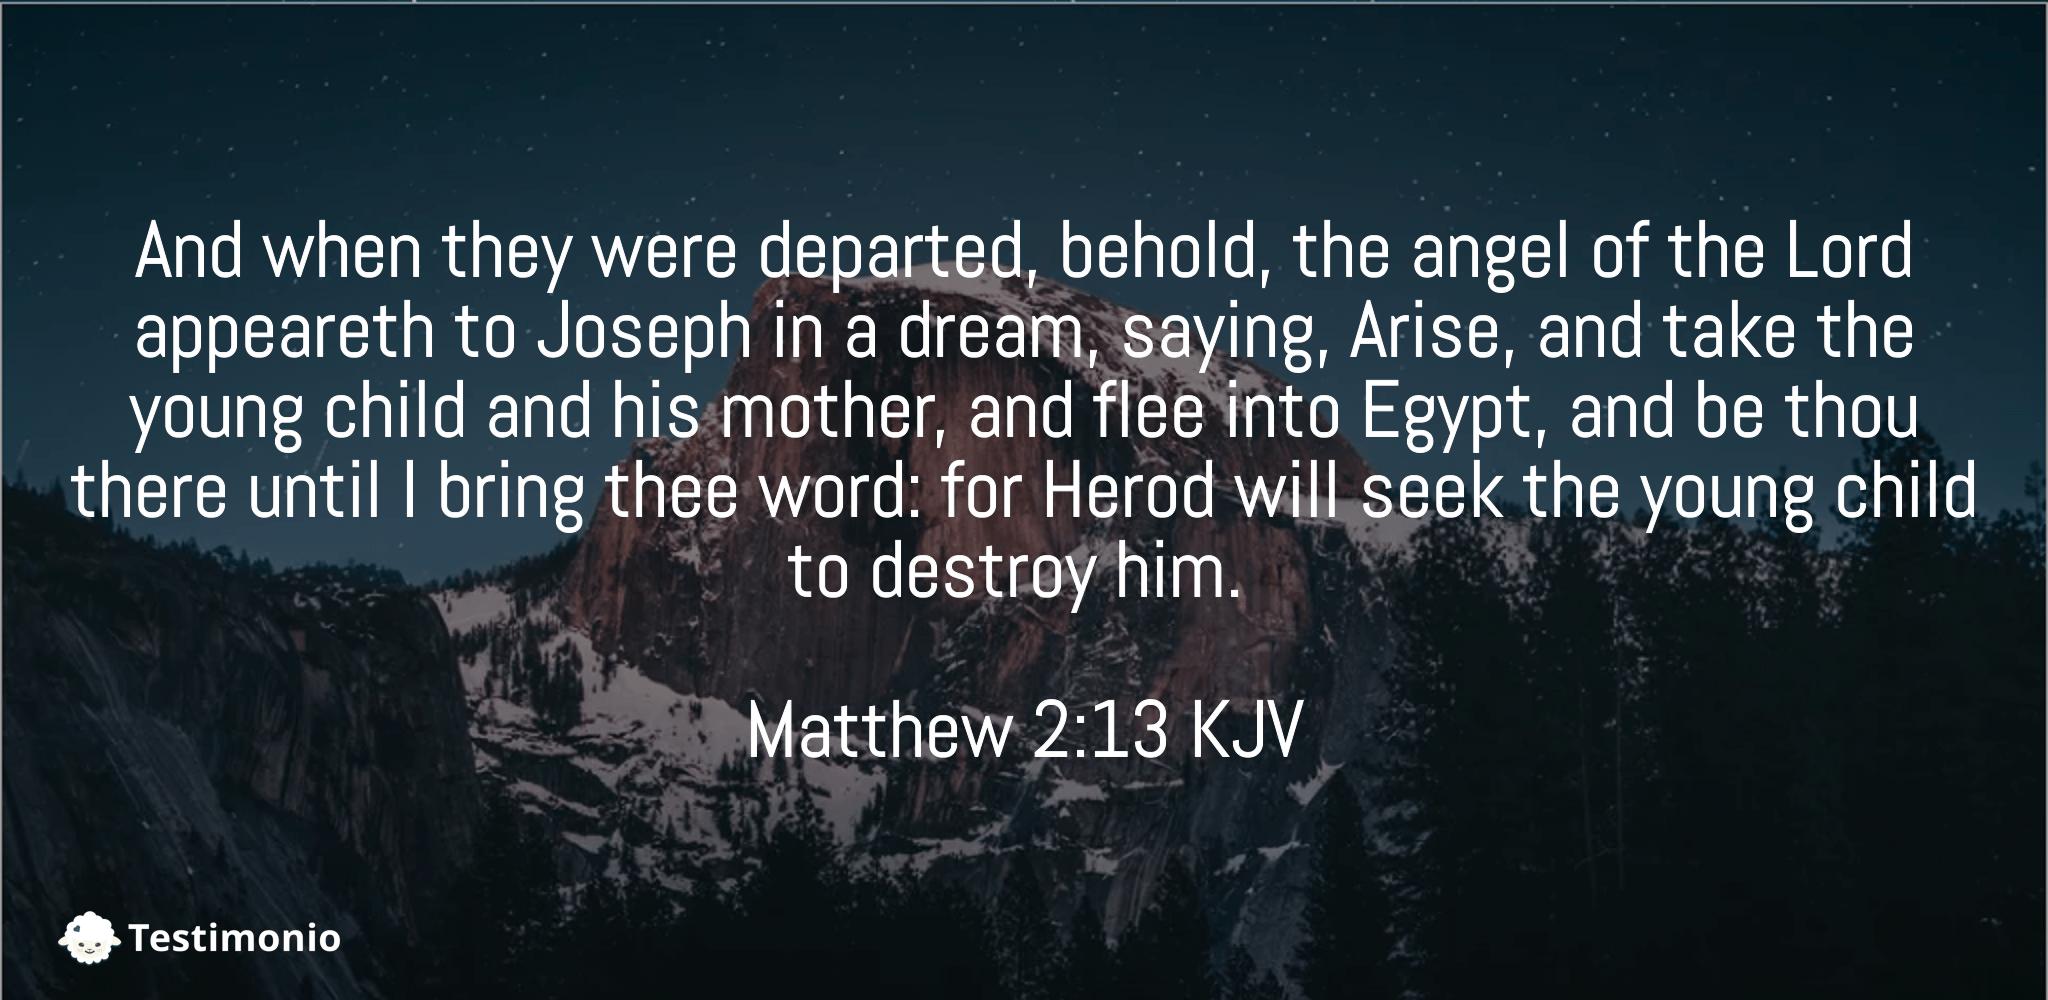 Matthew 2:13